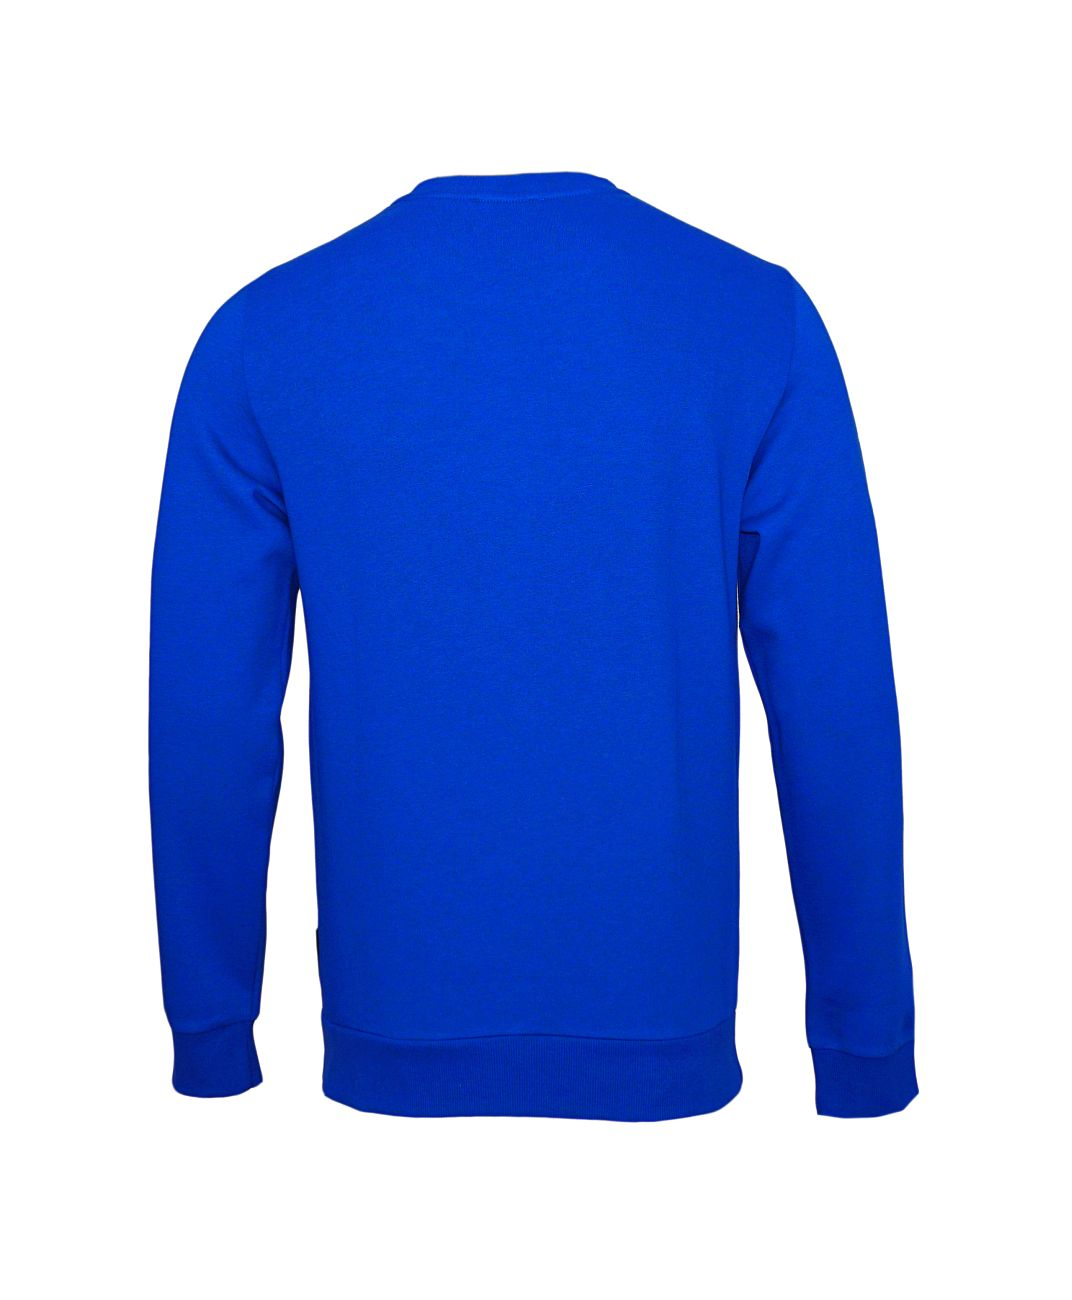 Emporio Armani Sweater Pullover Rundhals 111785 8A571 23233 MAZARINE SH18-EAS2